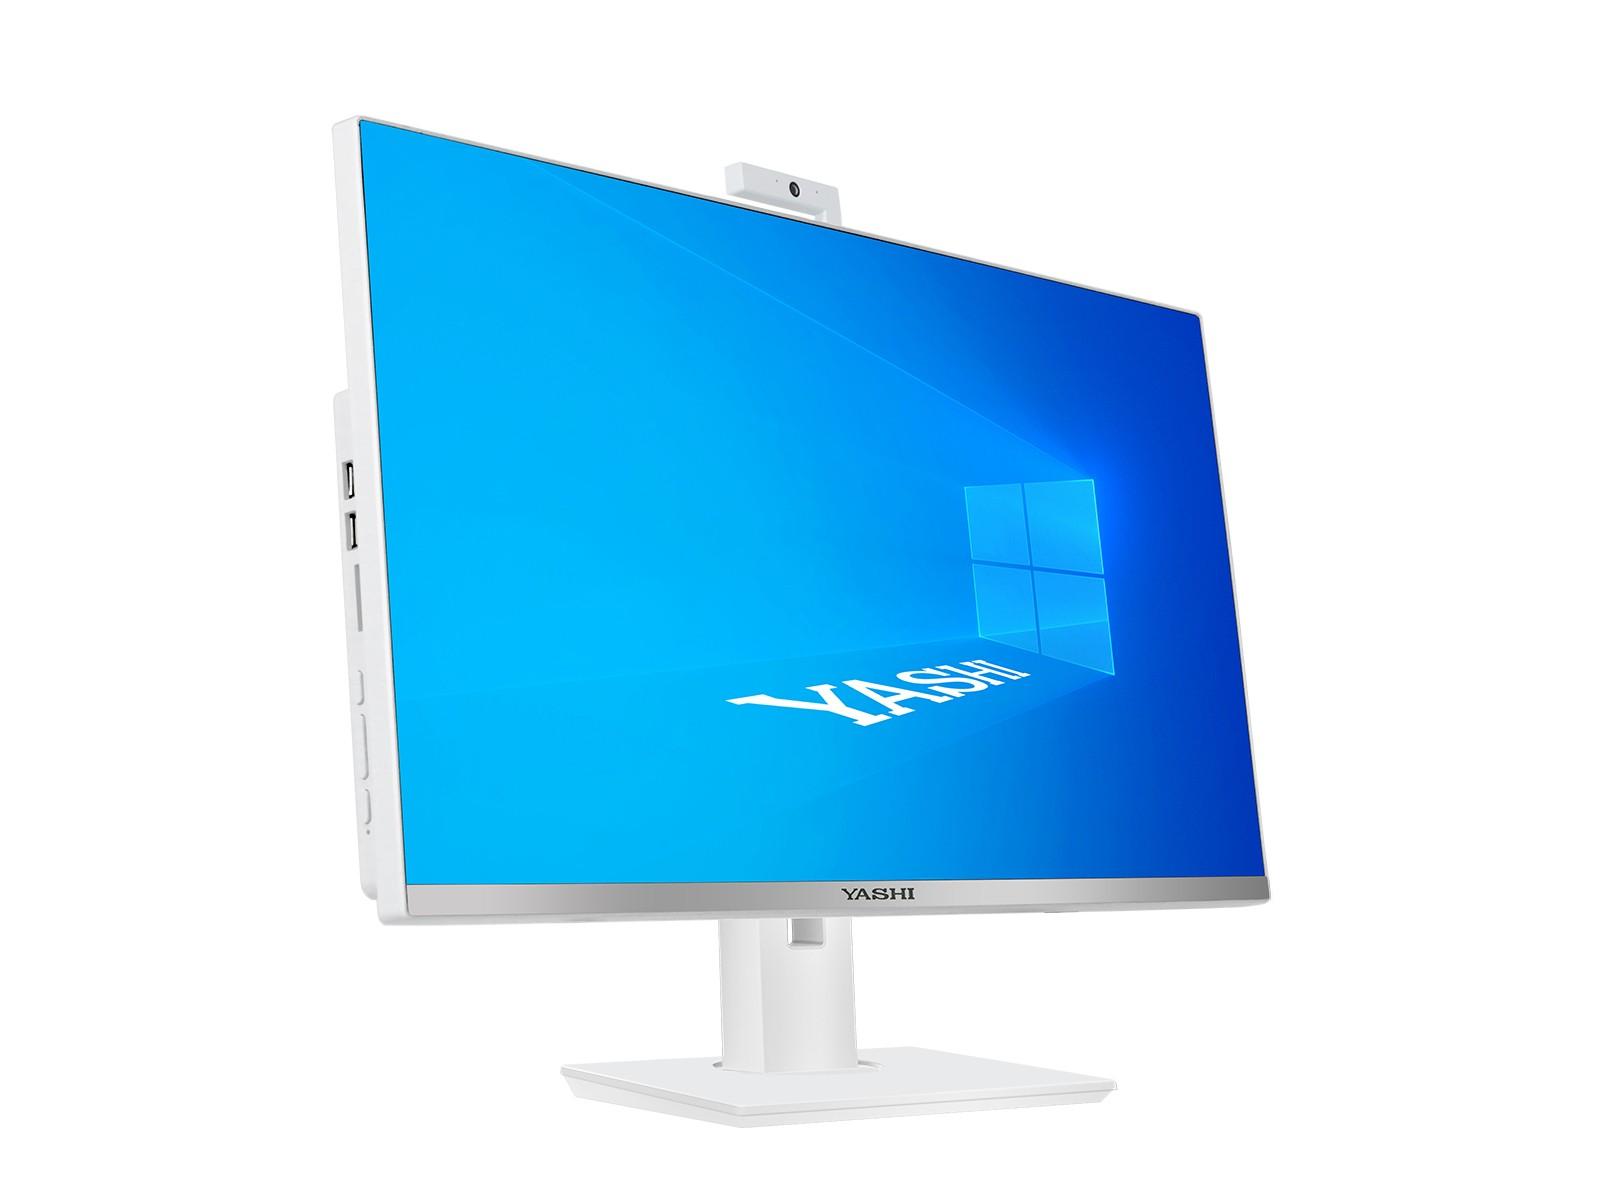 YASHI PC AIO QUANTUM S  I3 8100 8GB 240GB SSD 24 WIN 10 PRO ENT.